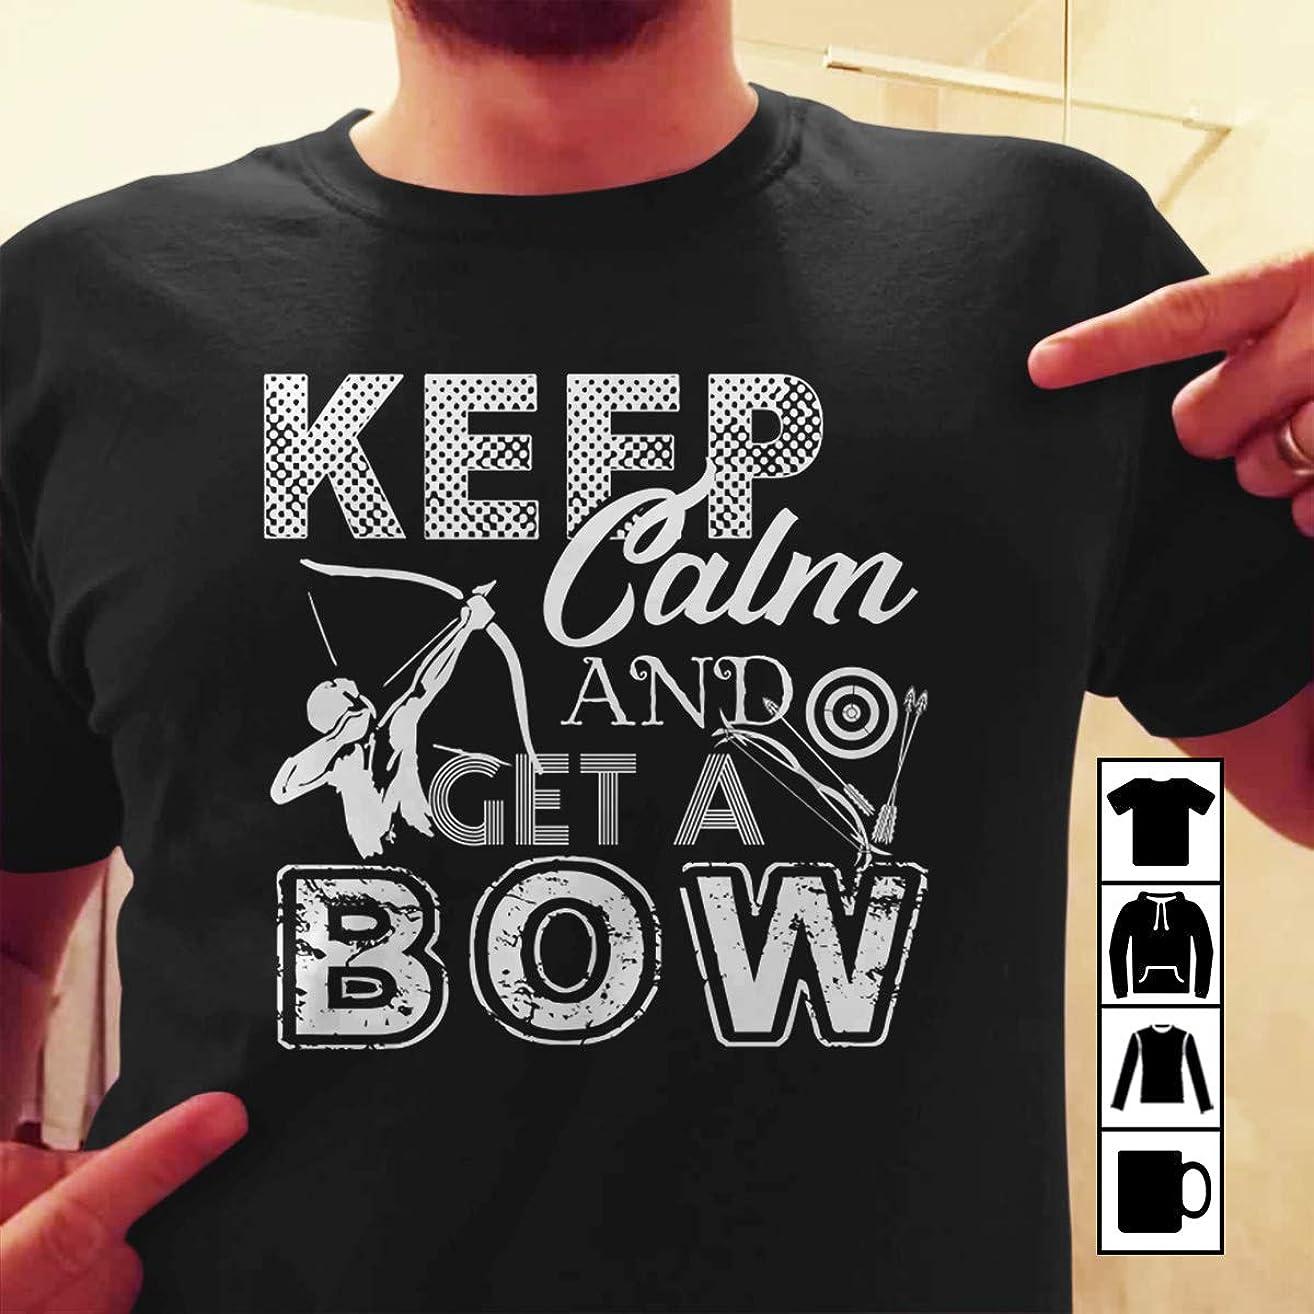 Bowman Archer Archery Keep calm and get a bow T Shirt Long Sleeve Sweatshirt Hoodie Youth